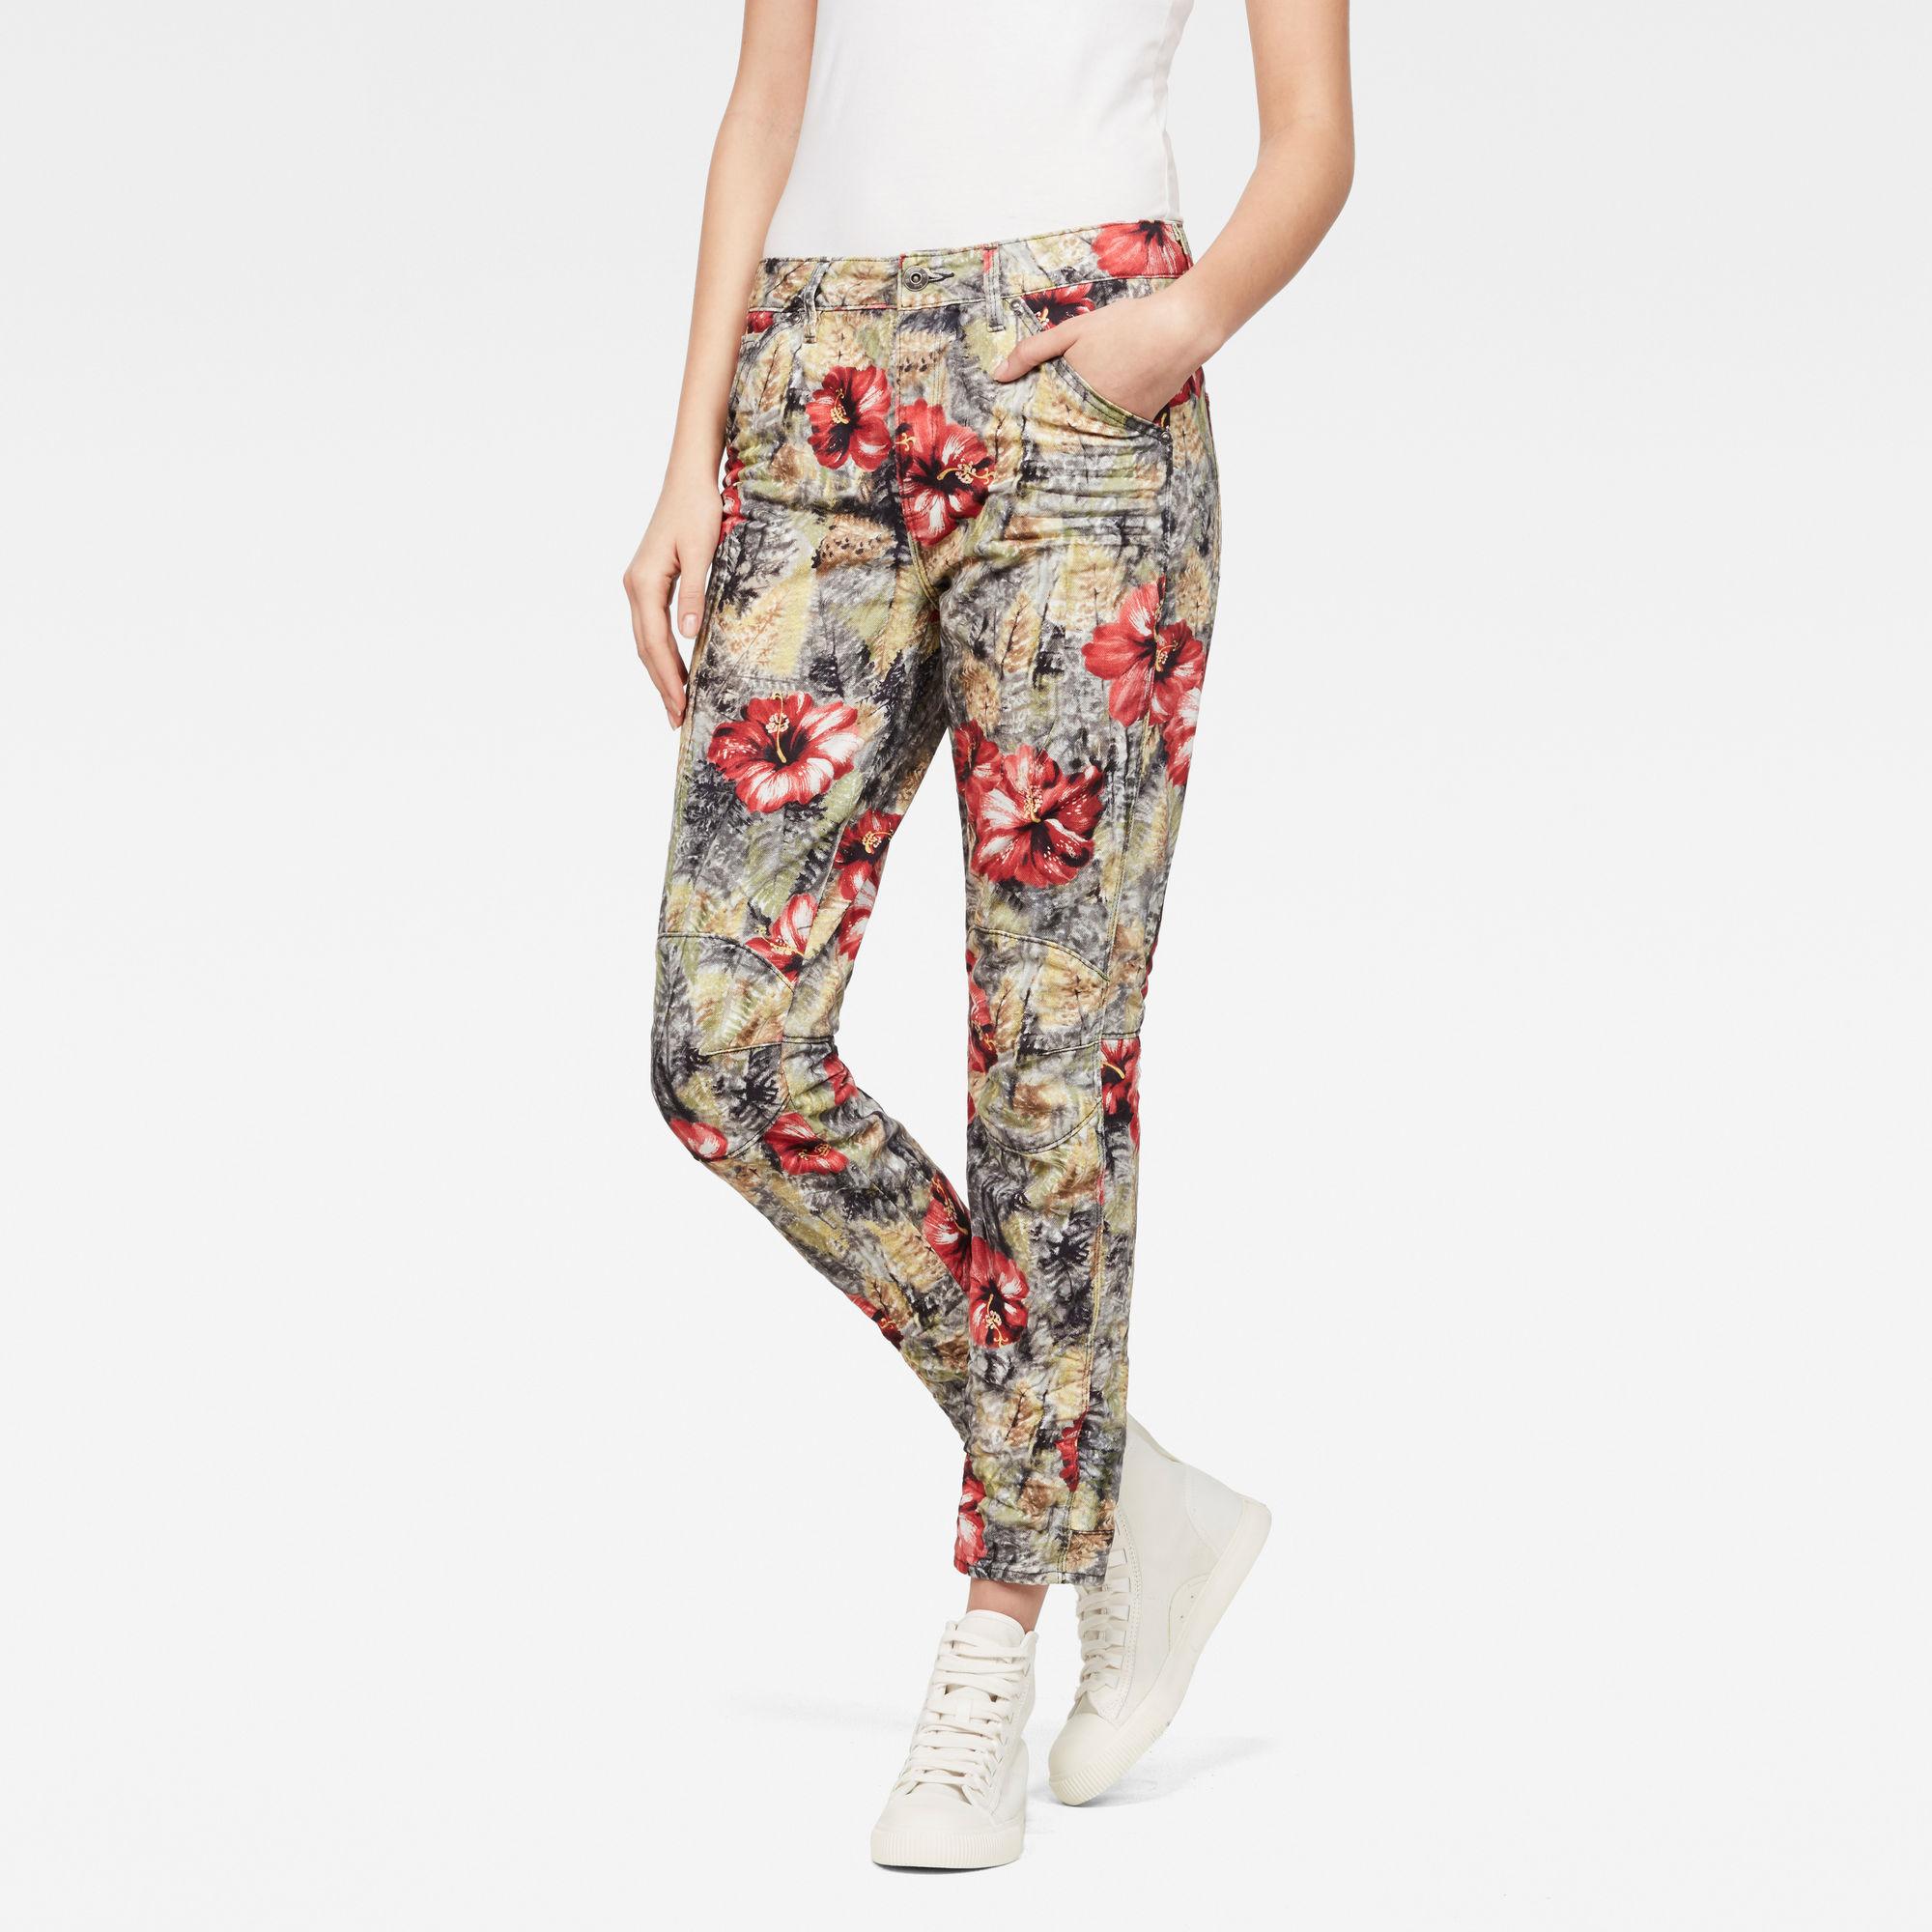 G-Star RAW Dames 5622 3D Mid waist Boyfriend Color Jeans Rood